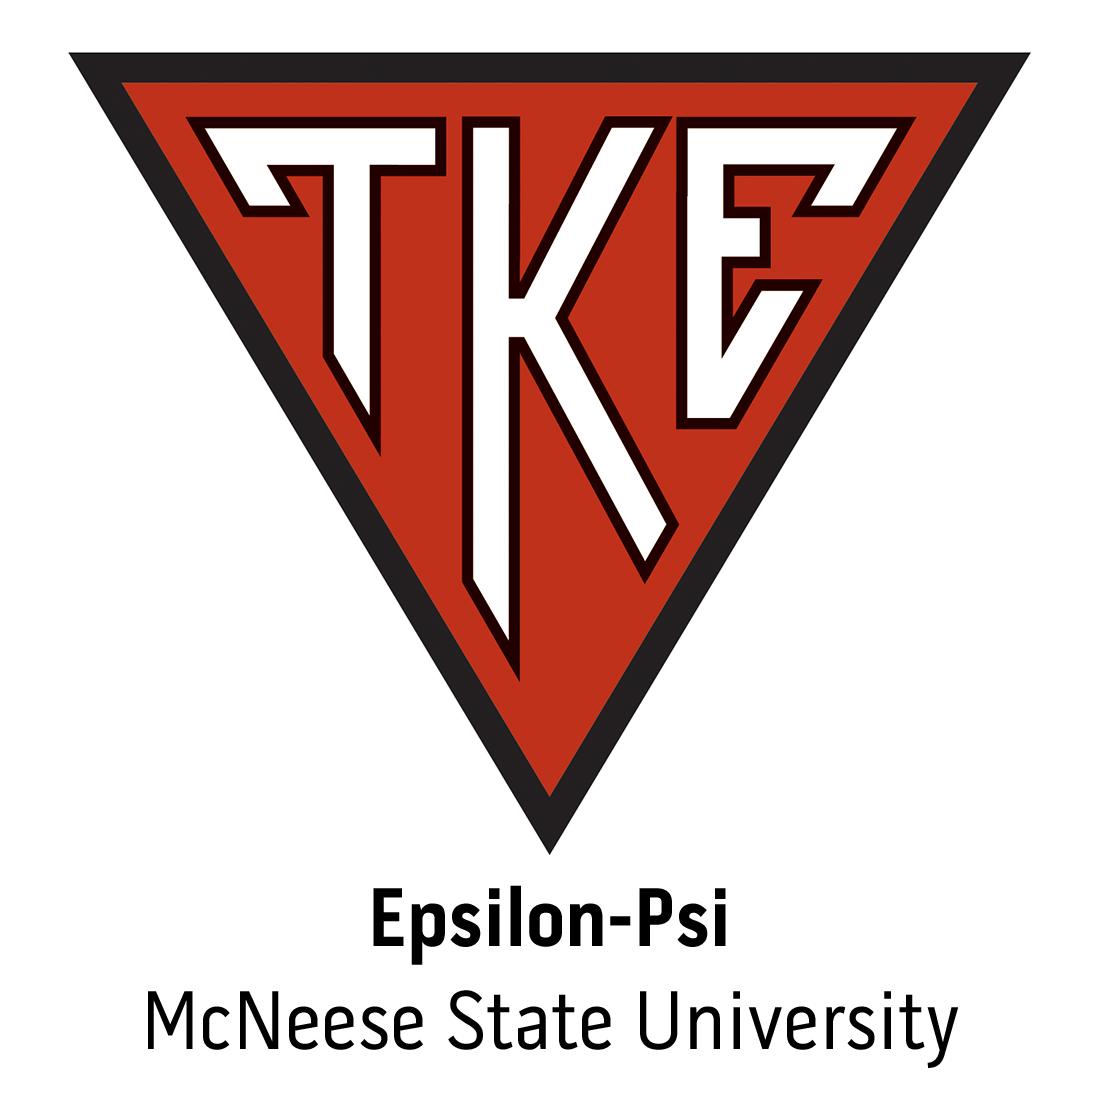 Epsilon-Psi Chapter at McNeese State University